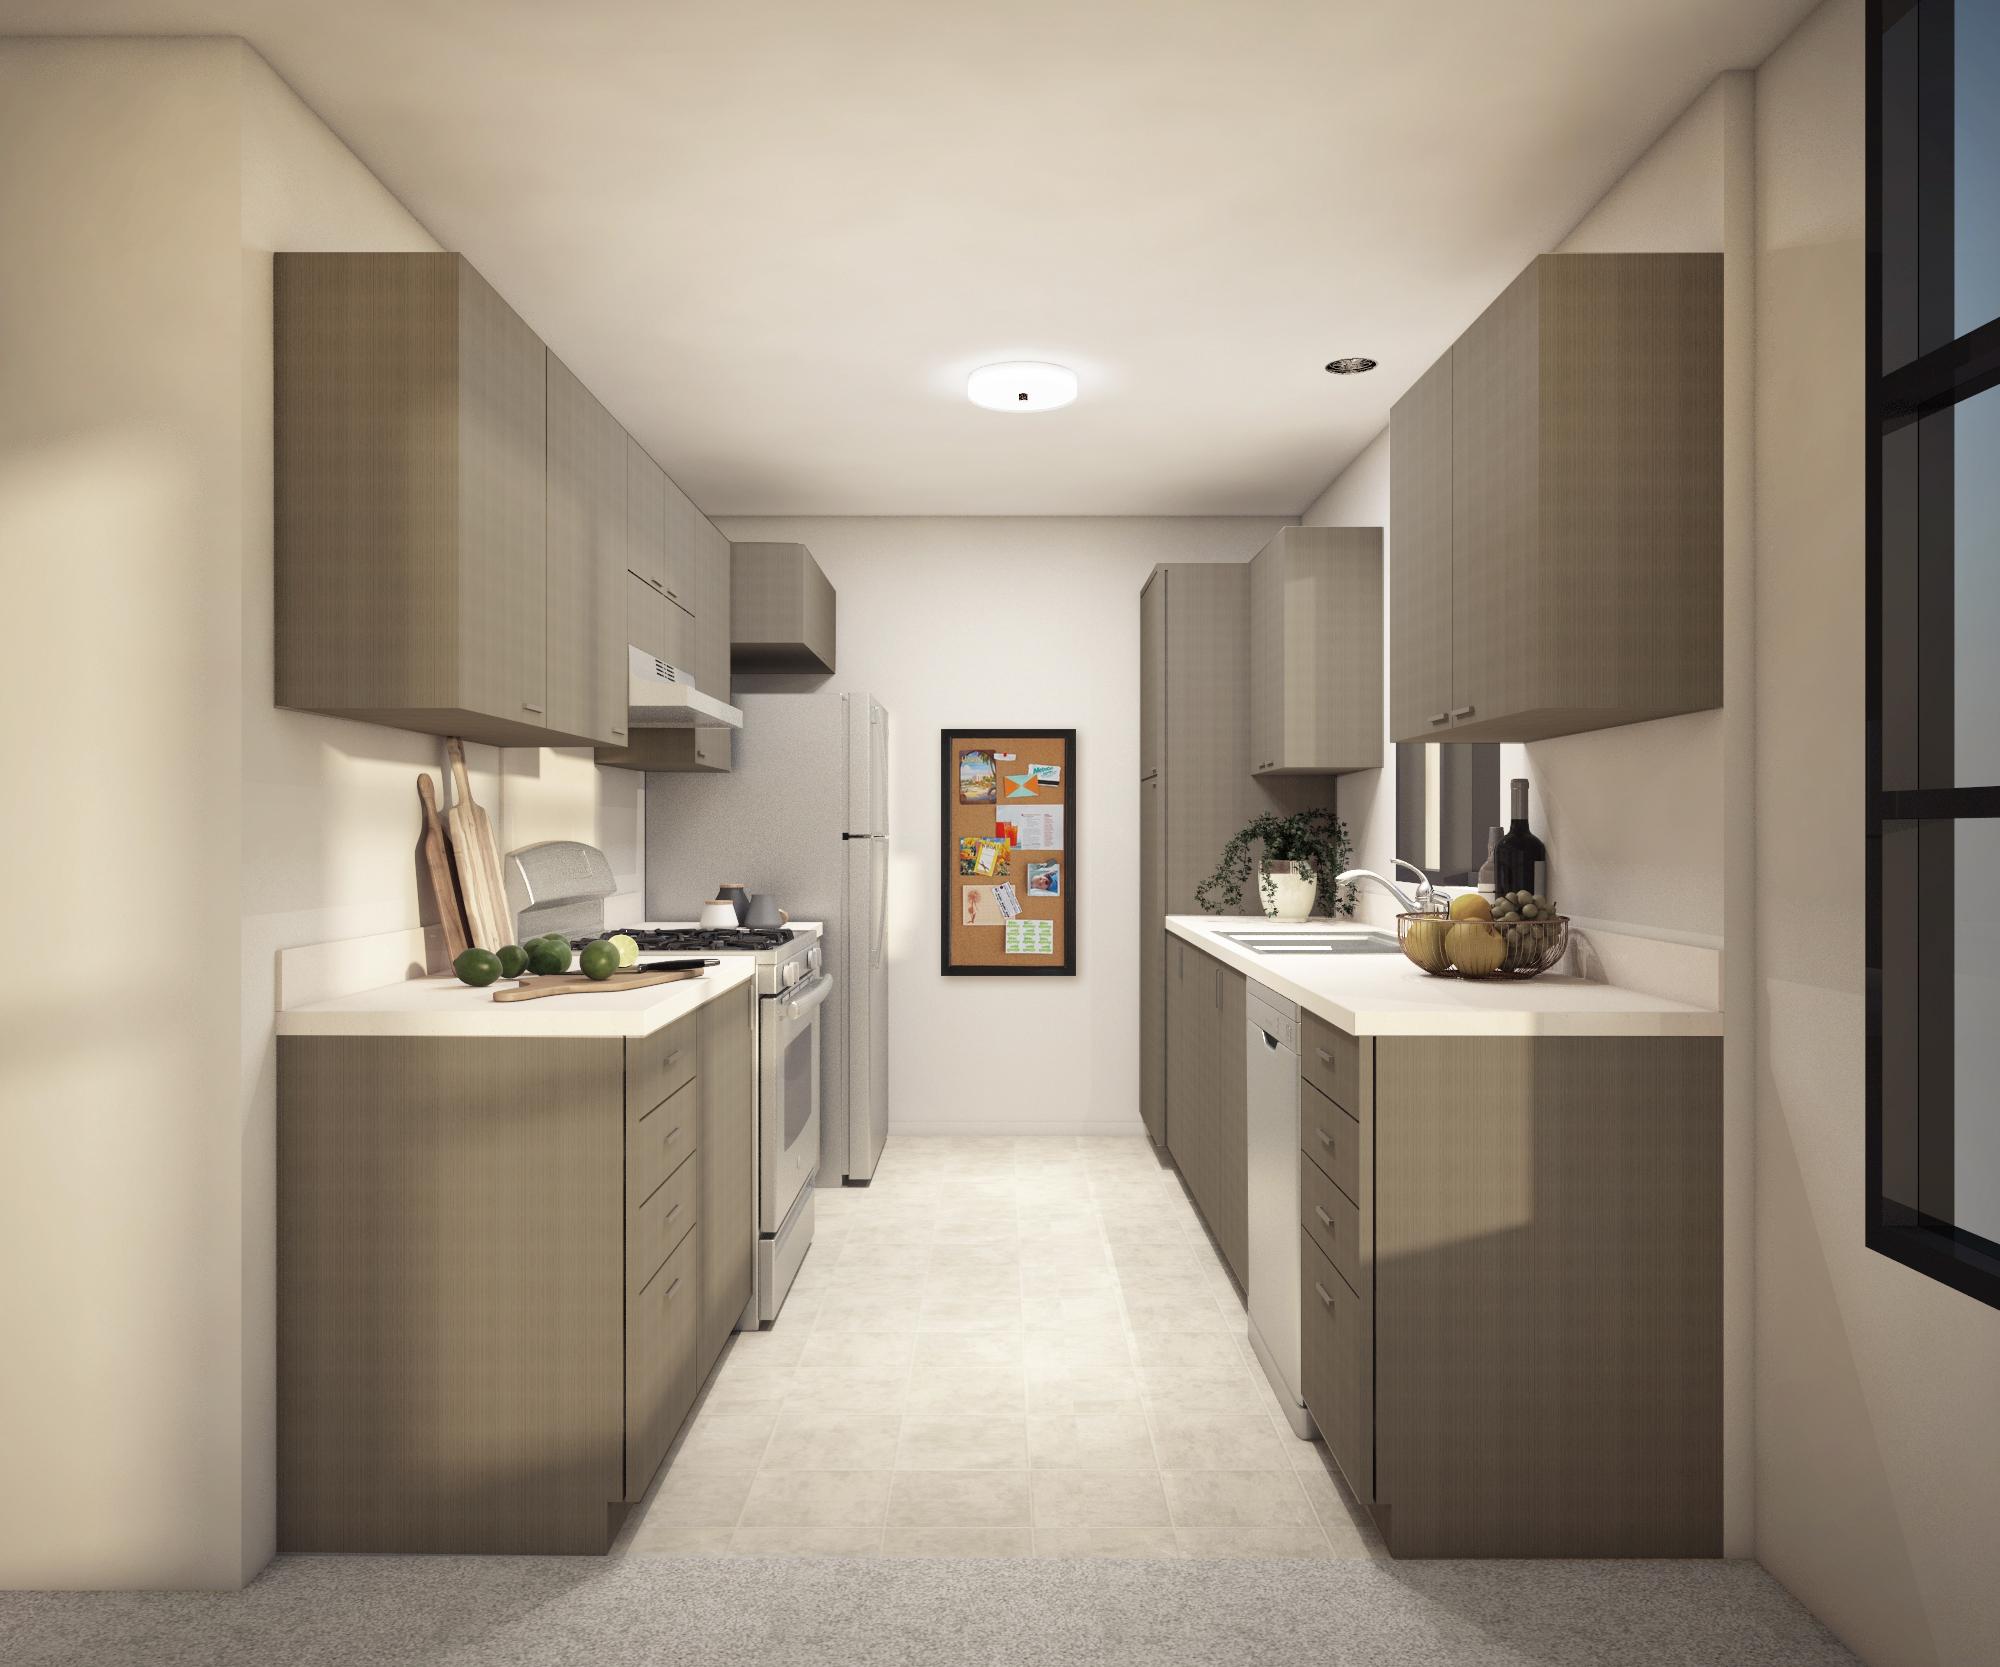 kamalani model F kitchen.jpg